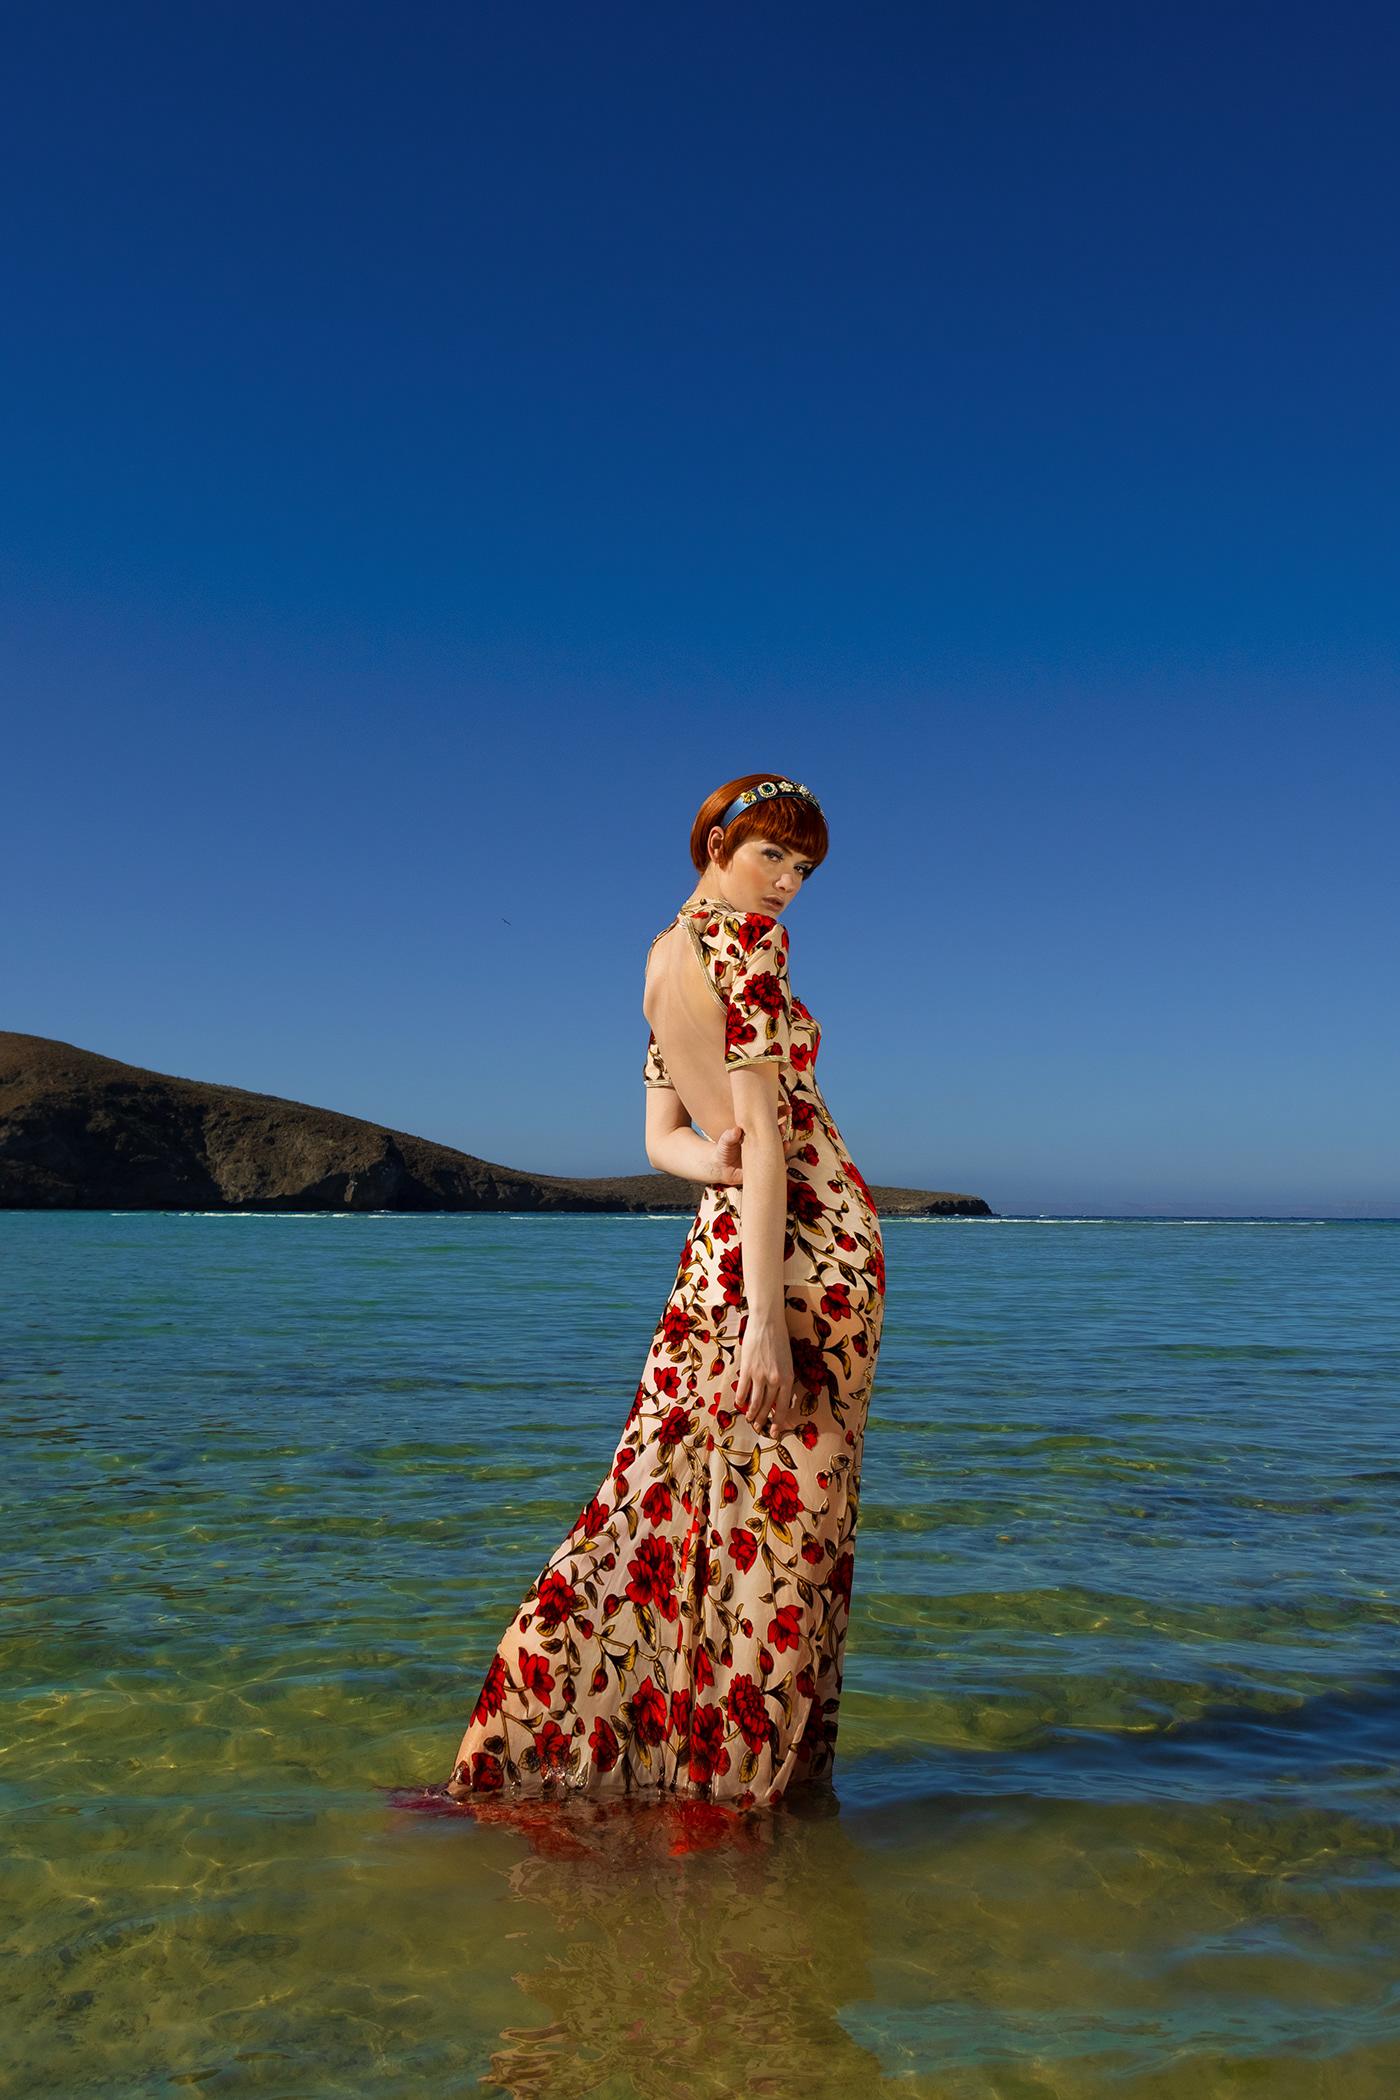 art,beach,campaign,commercial,Fashion ,photo,summer